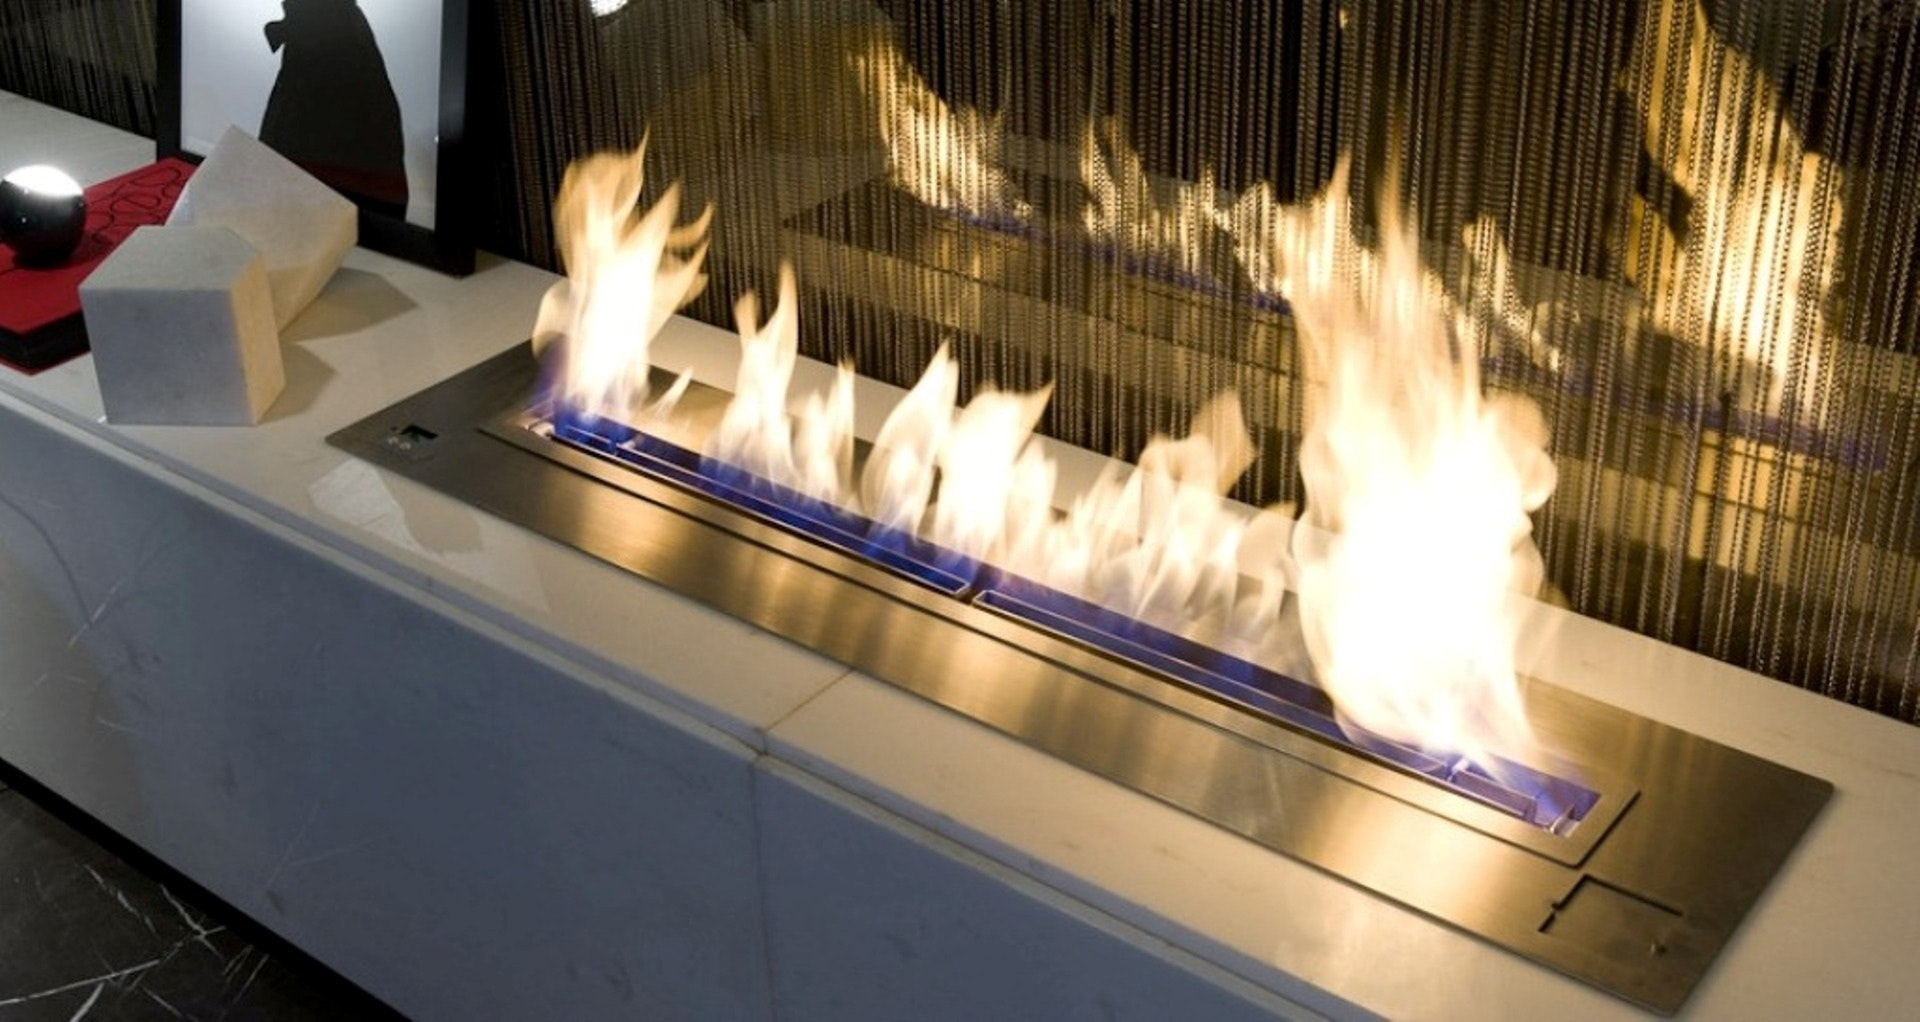 bioethanol-burner-burner-ecofriendly-266915.jpg